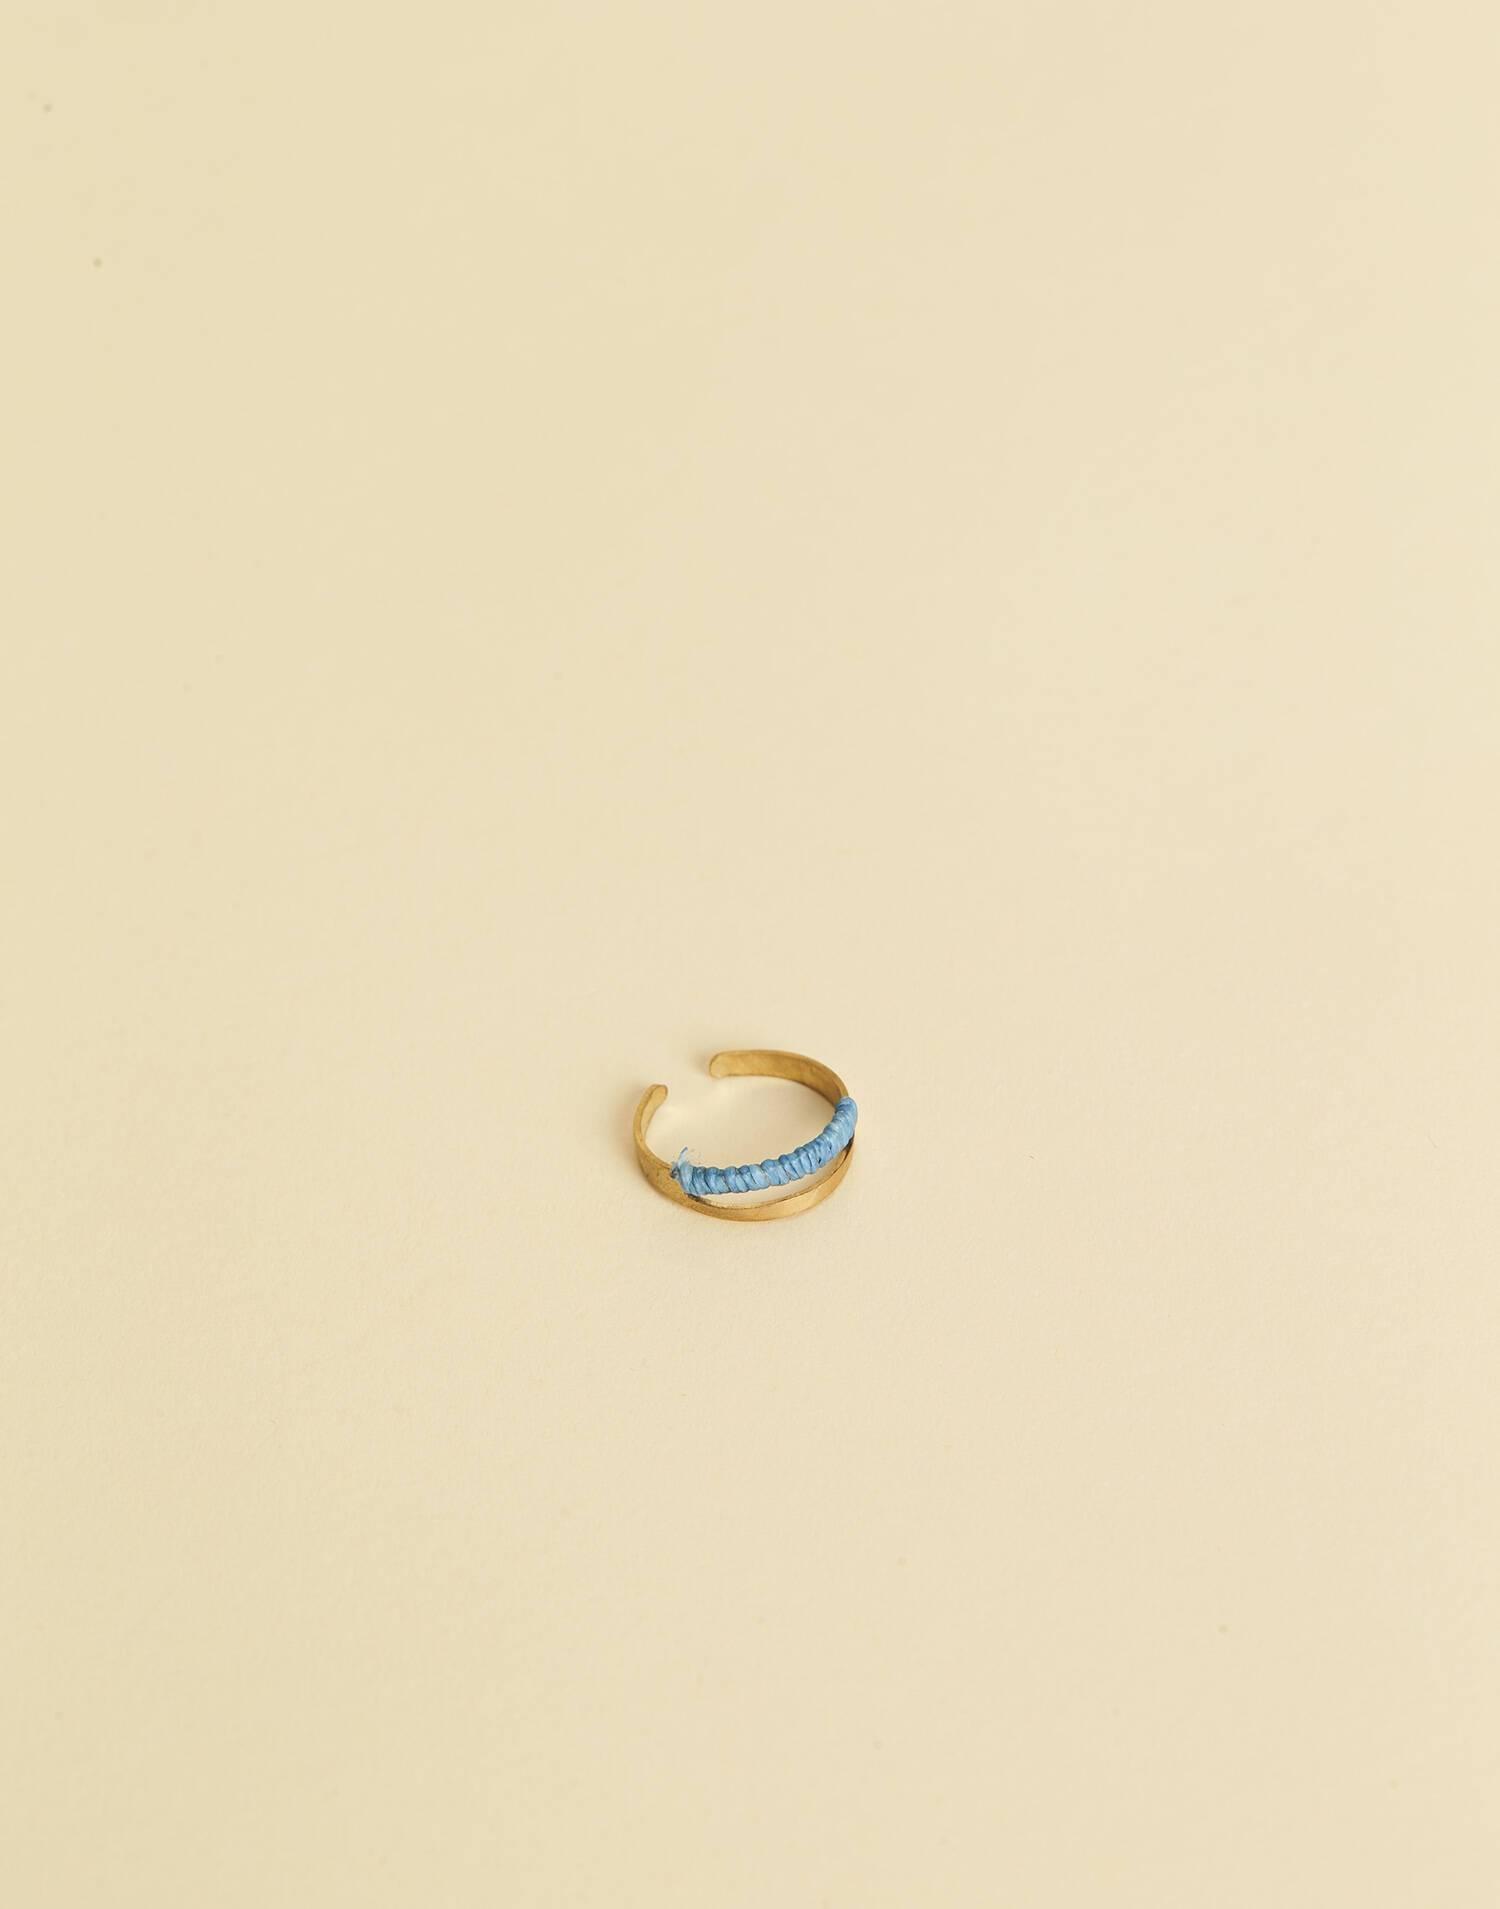 THREAD RING